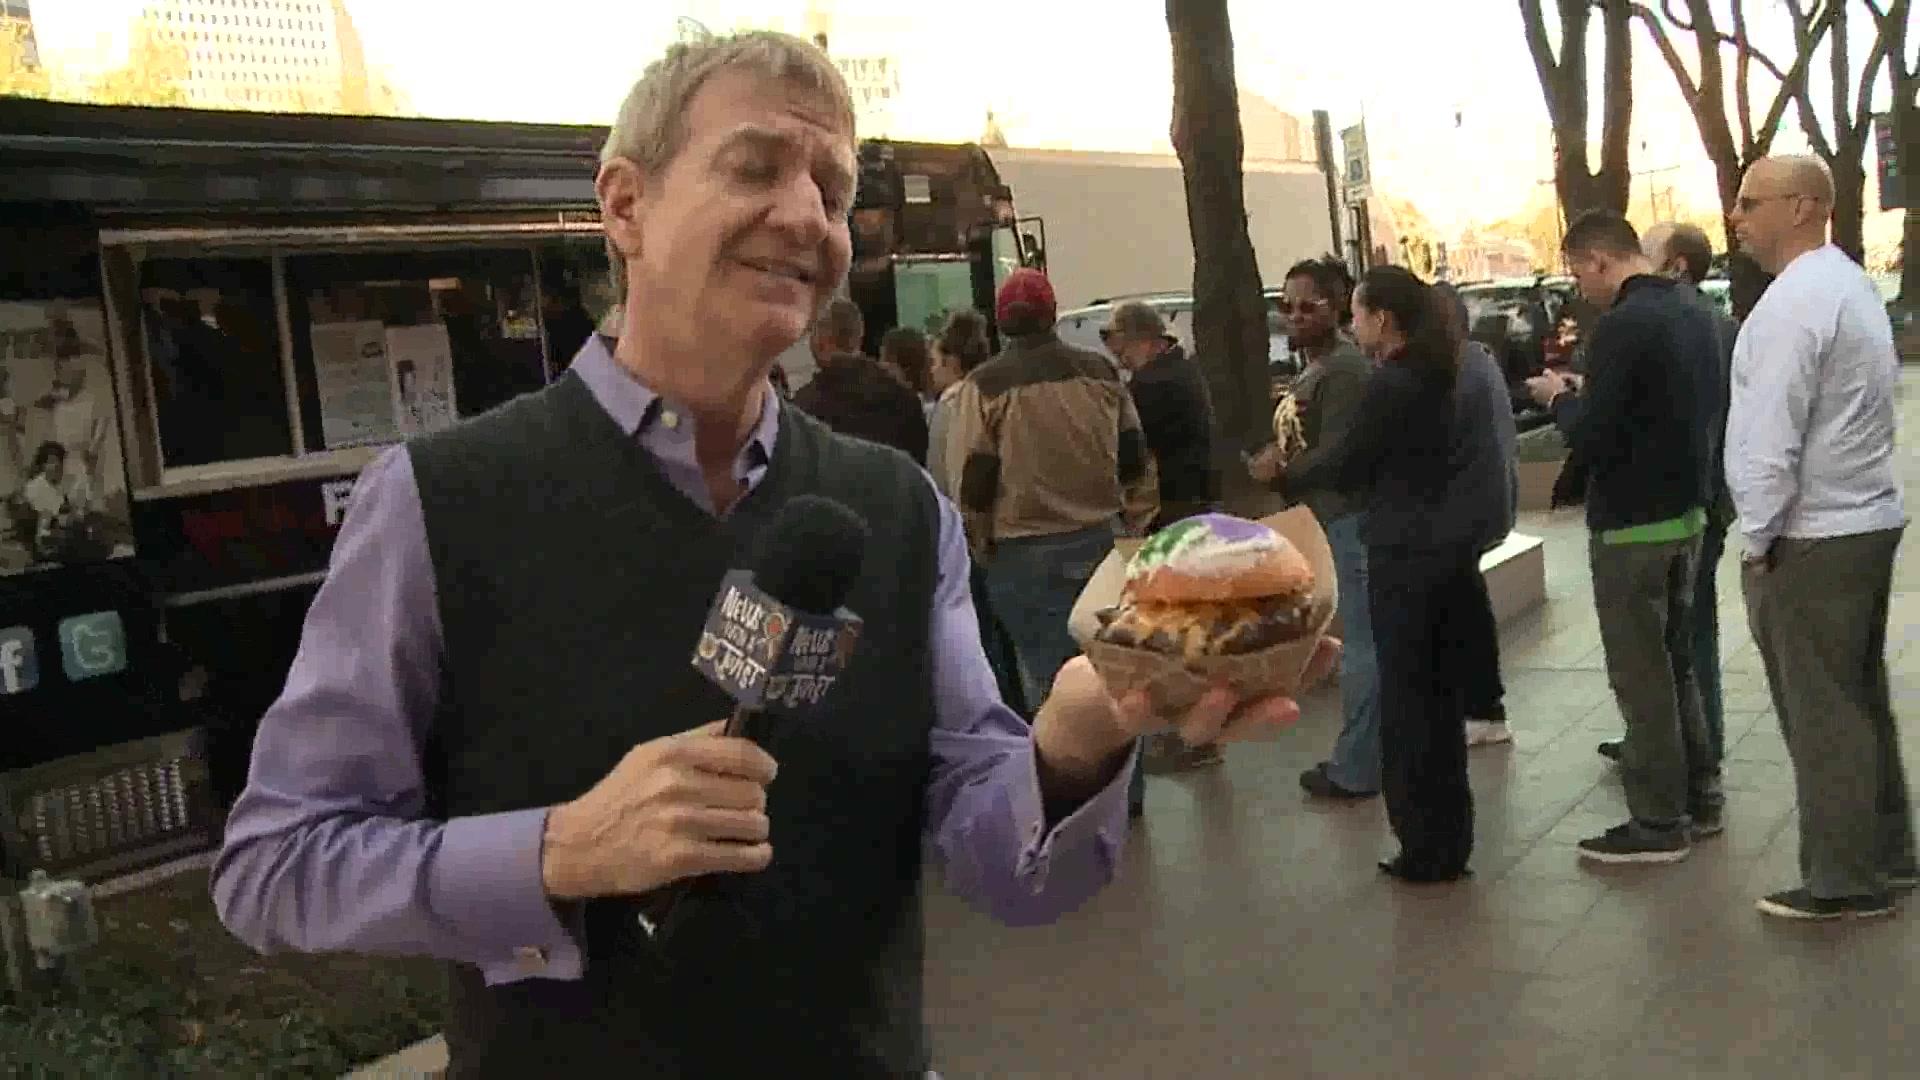 Celebrate Mardi Gras with a King Cake Burger